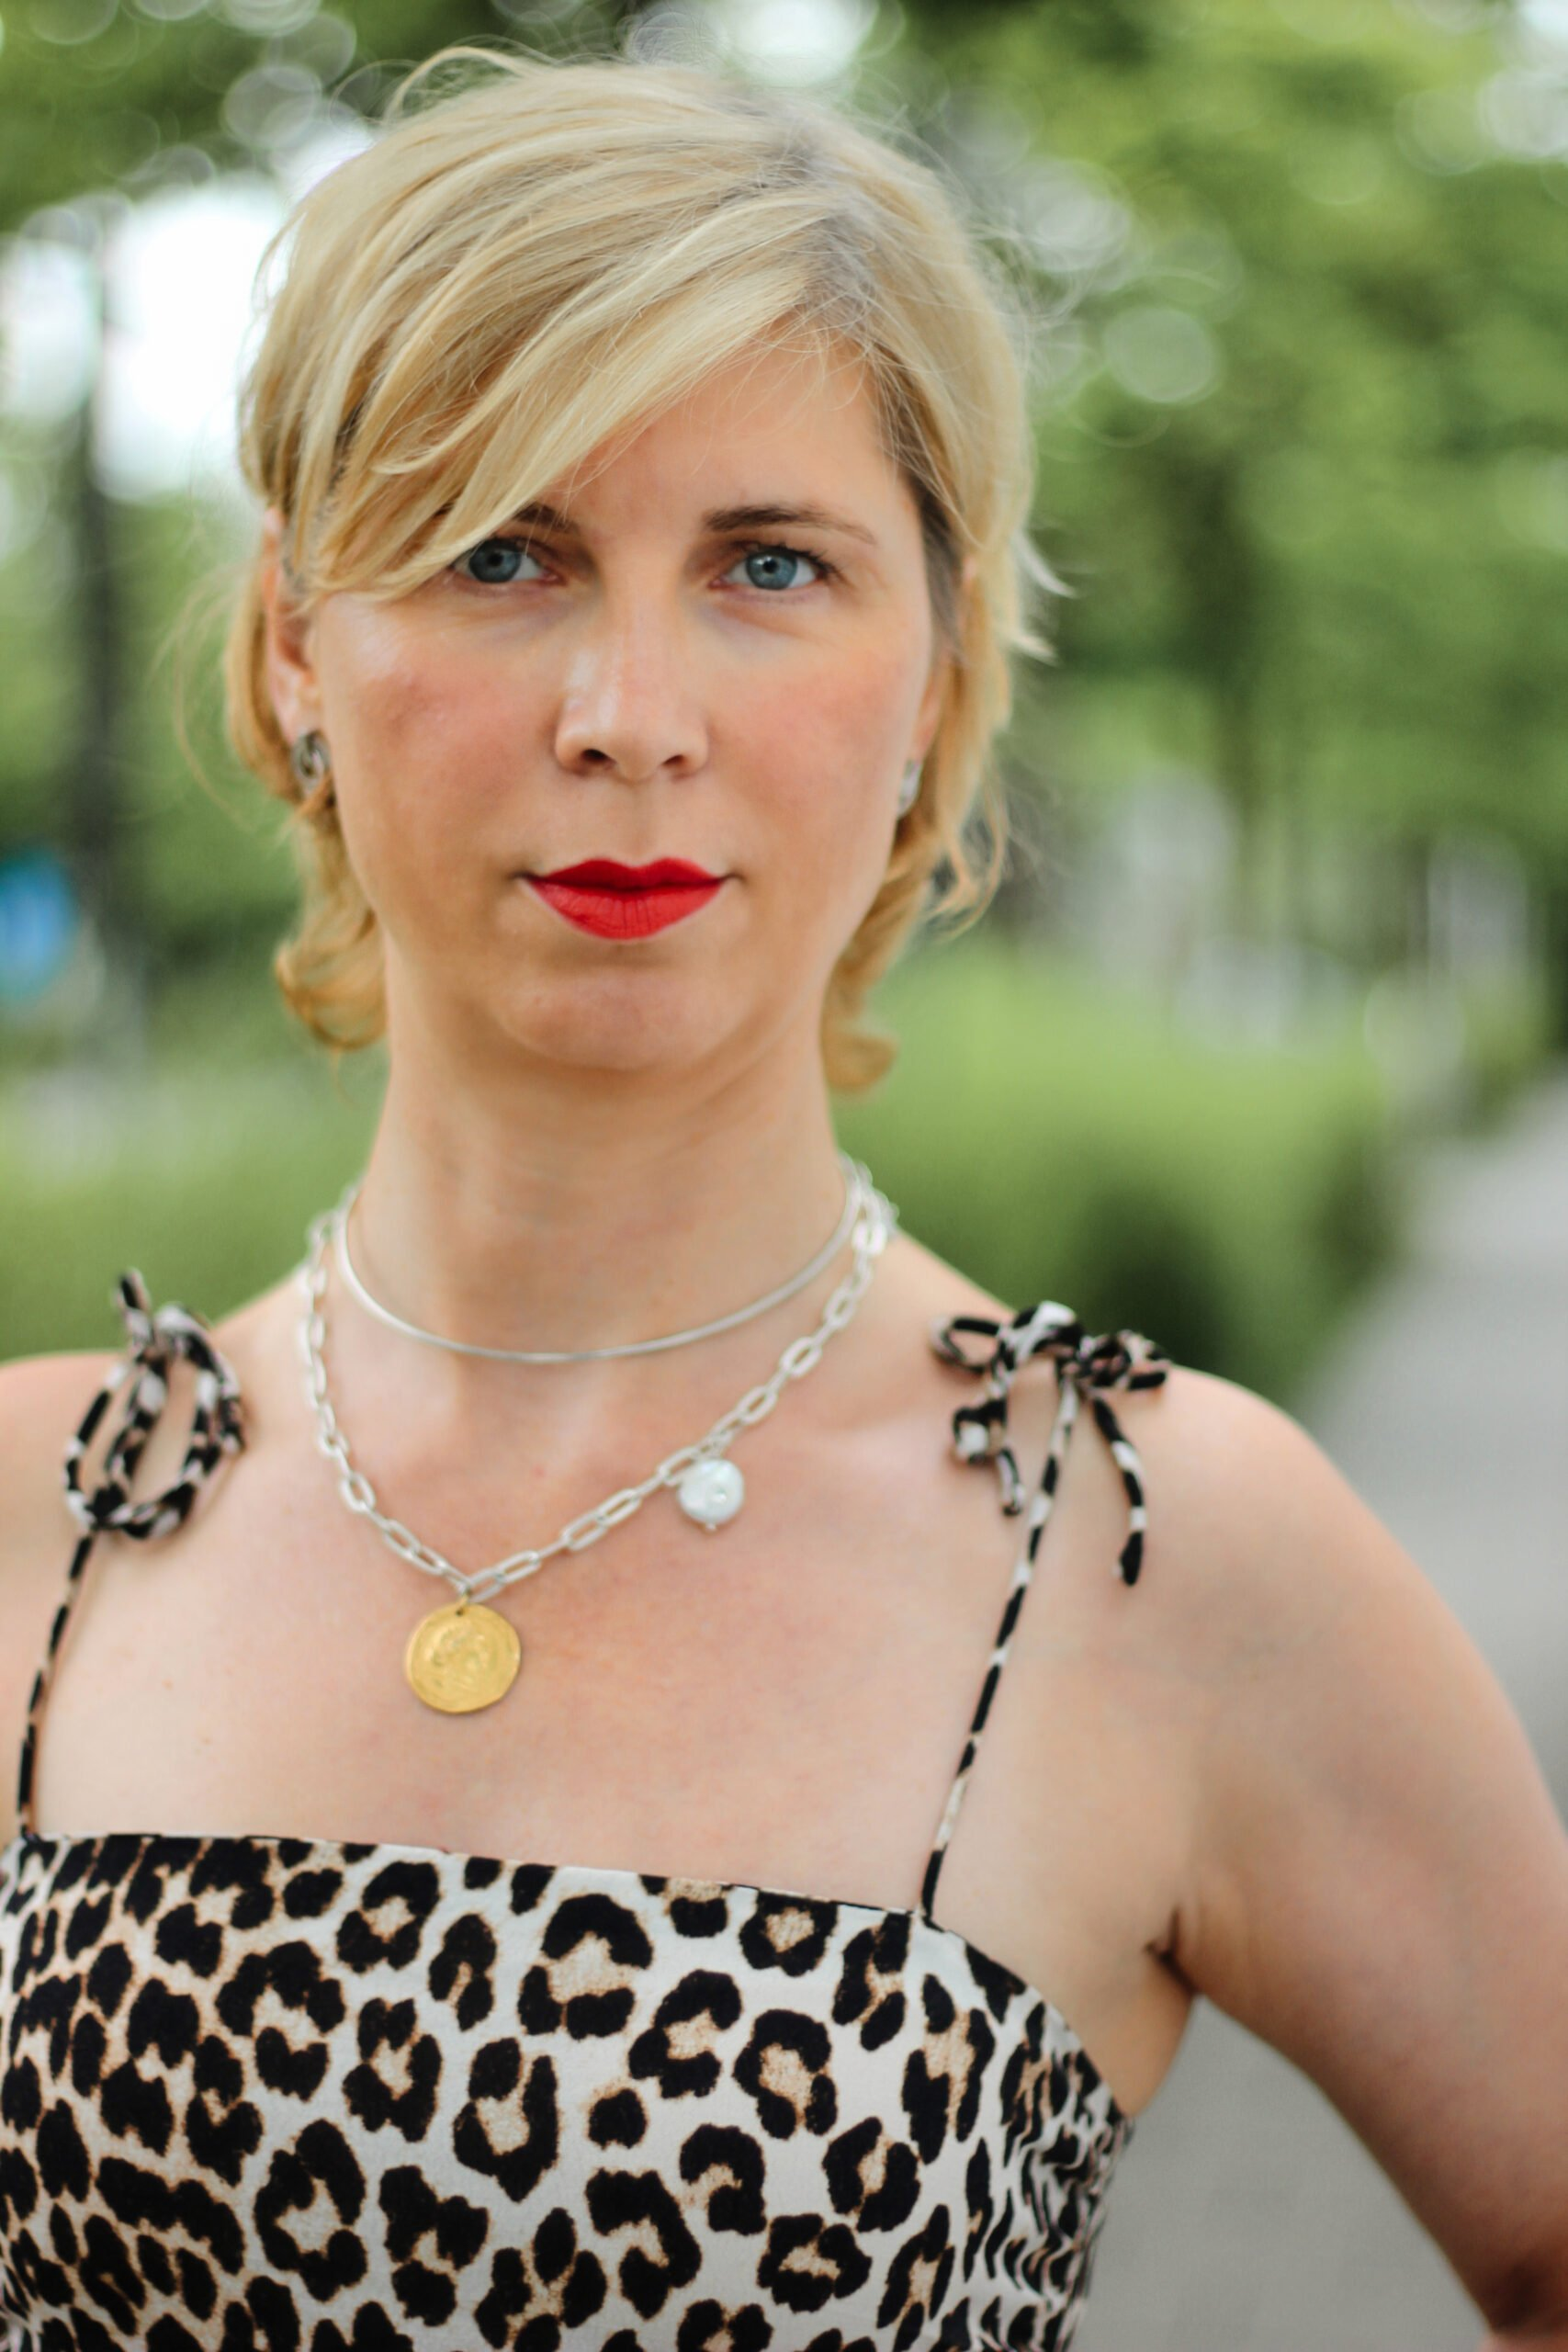 conny doll lifestyle: Porträt, blonde, kurze Haare